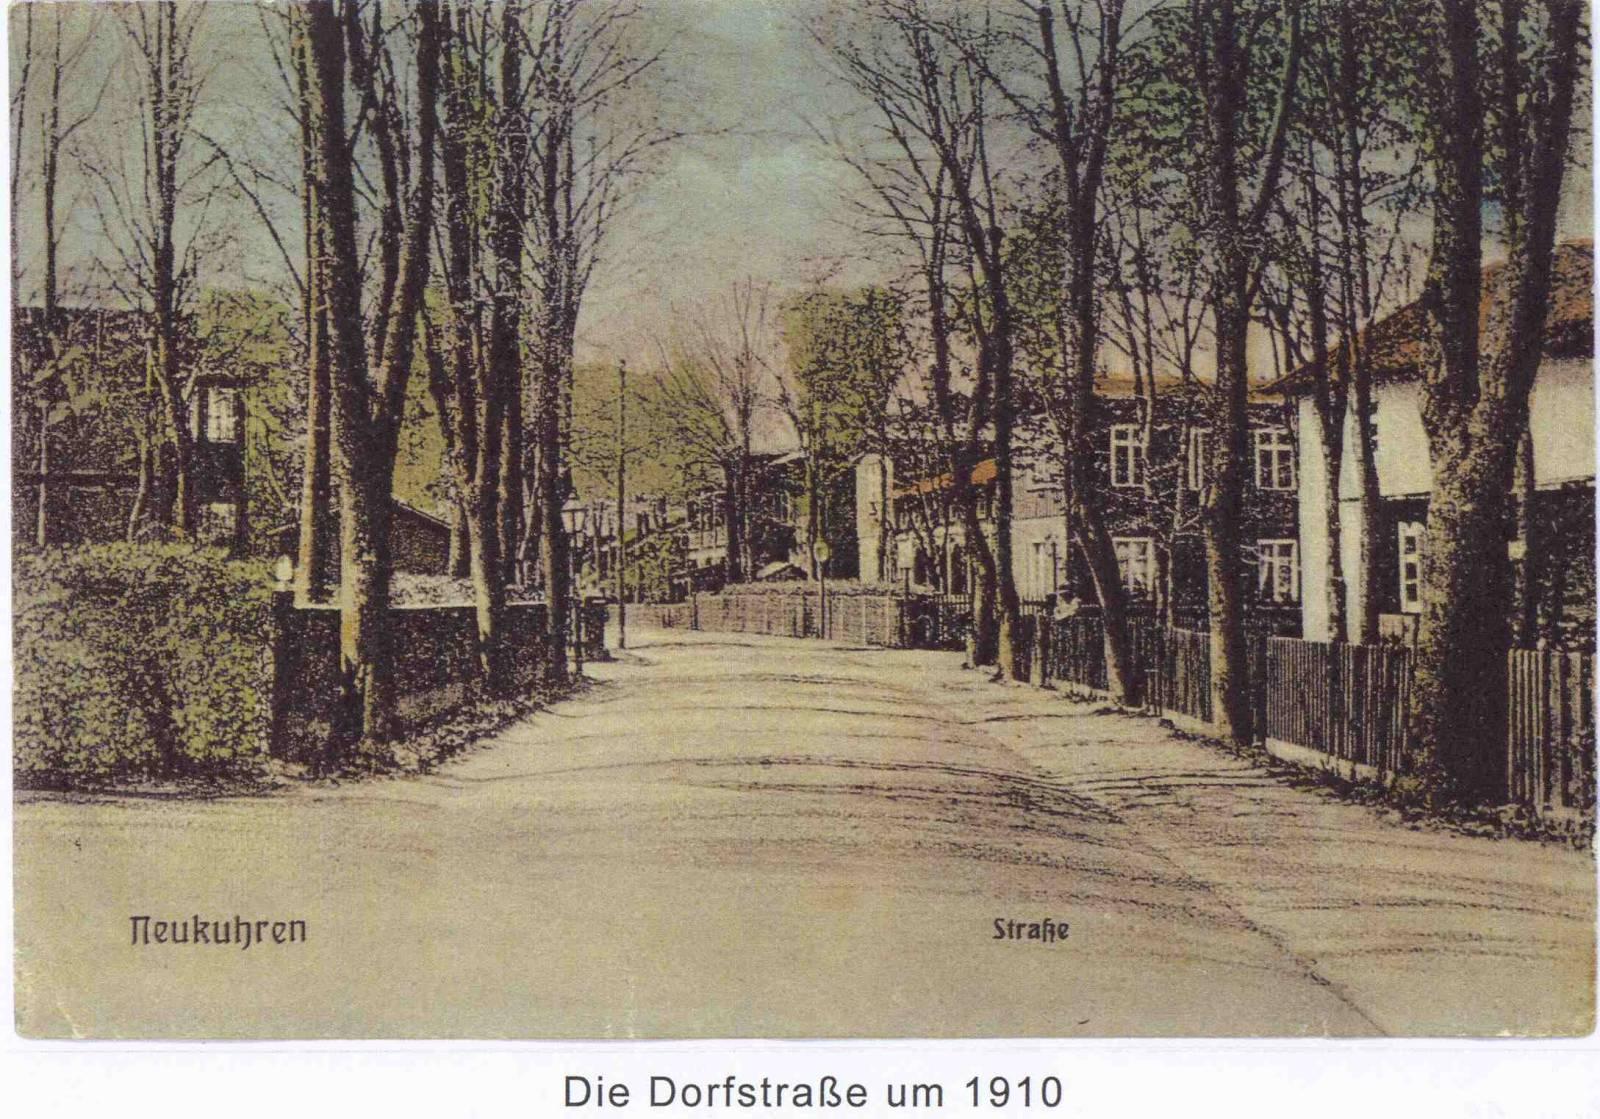 Дорфштрассе в Нойкурене, 1910 г.